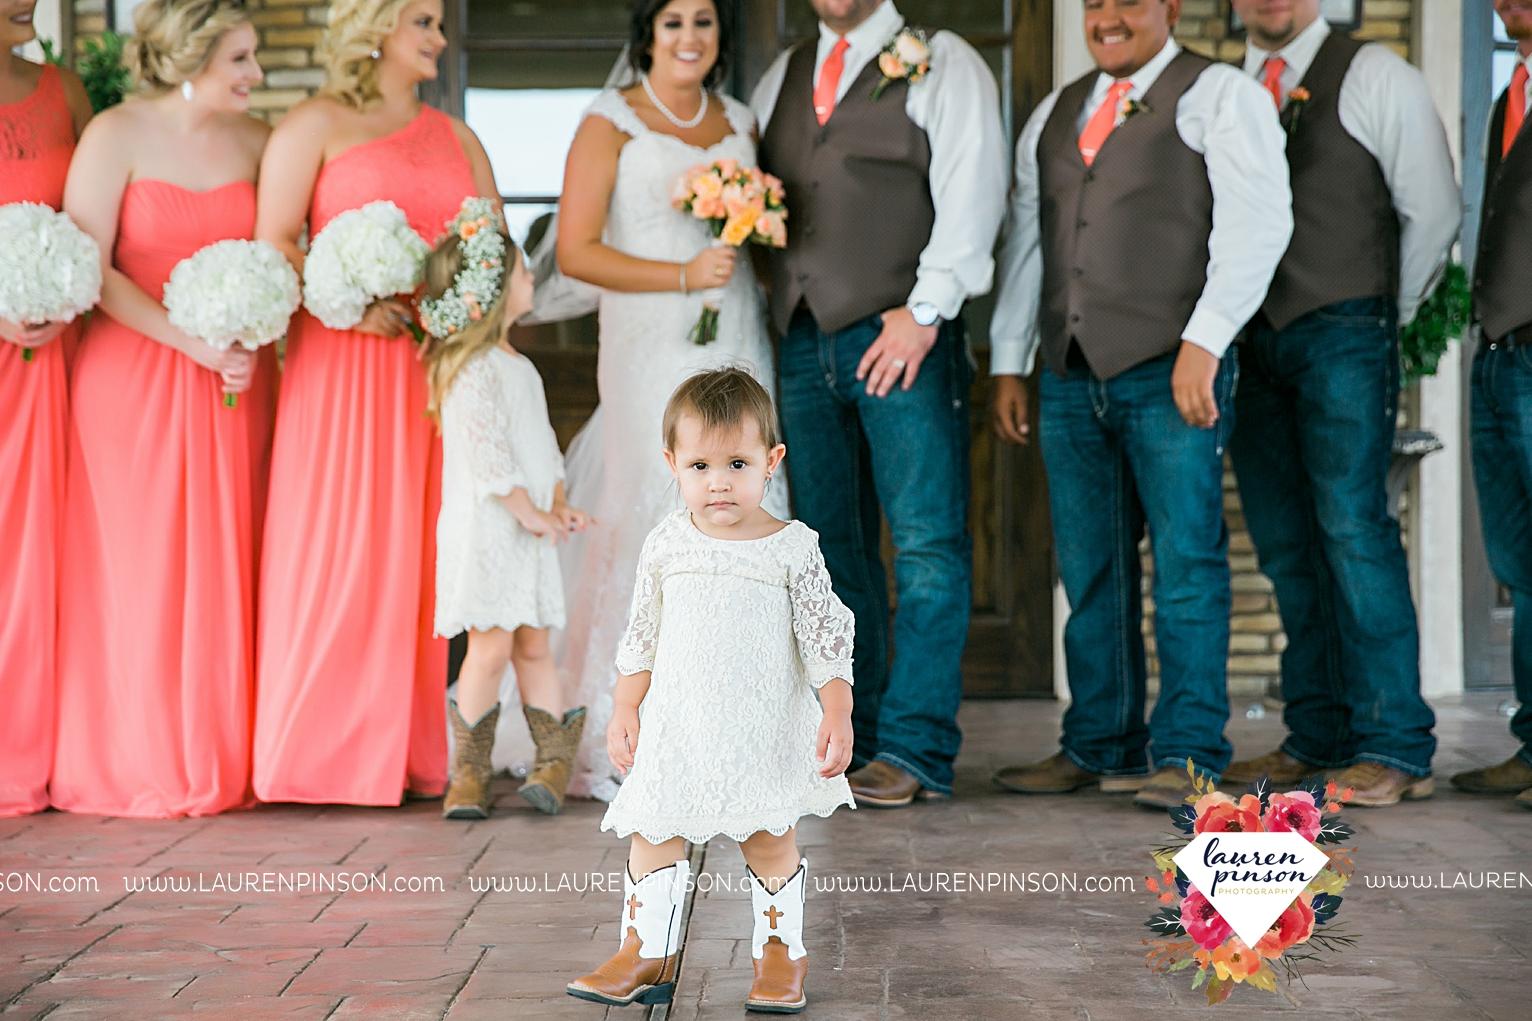 wichita-falls-texas-wedding-photographer-wellington-on-the-lake-with-mayfield-events_2954.jpg